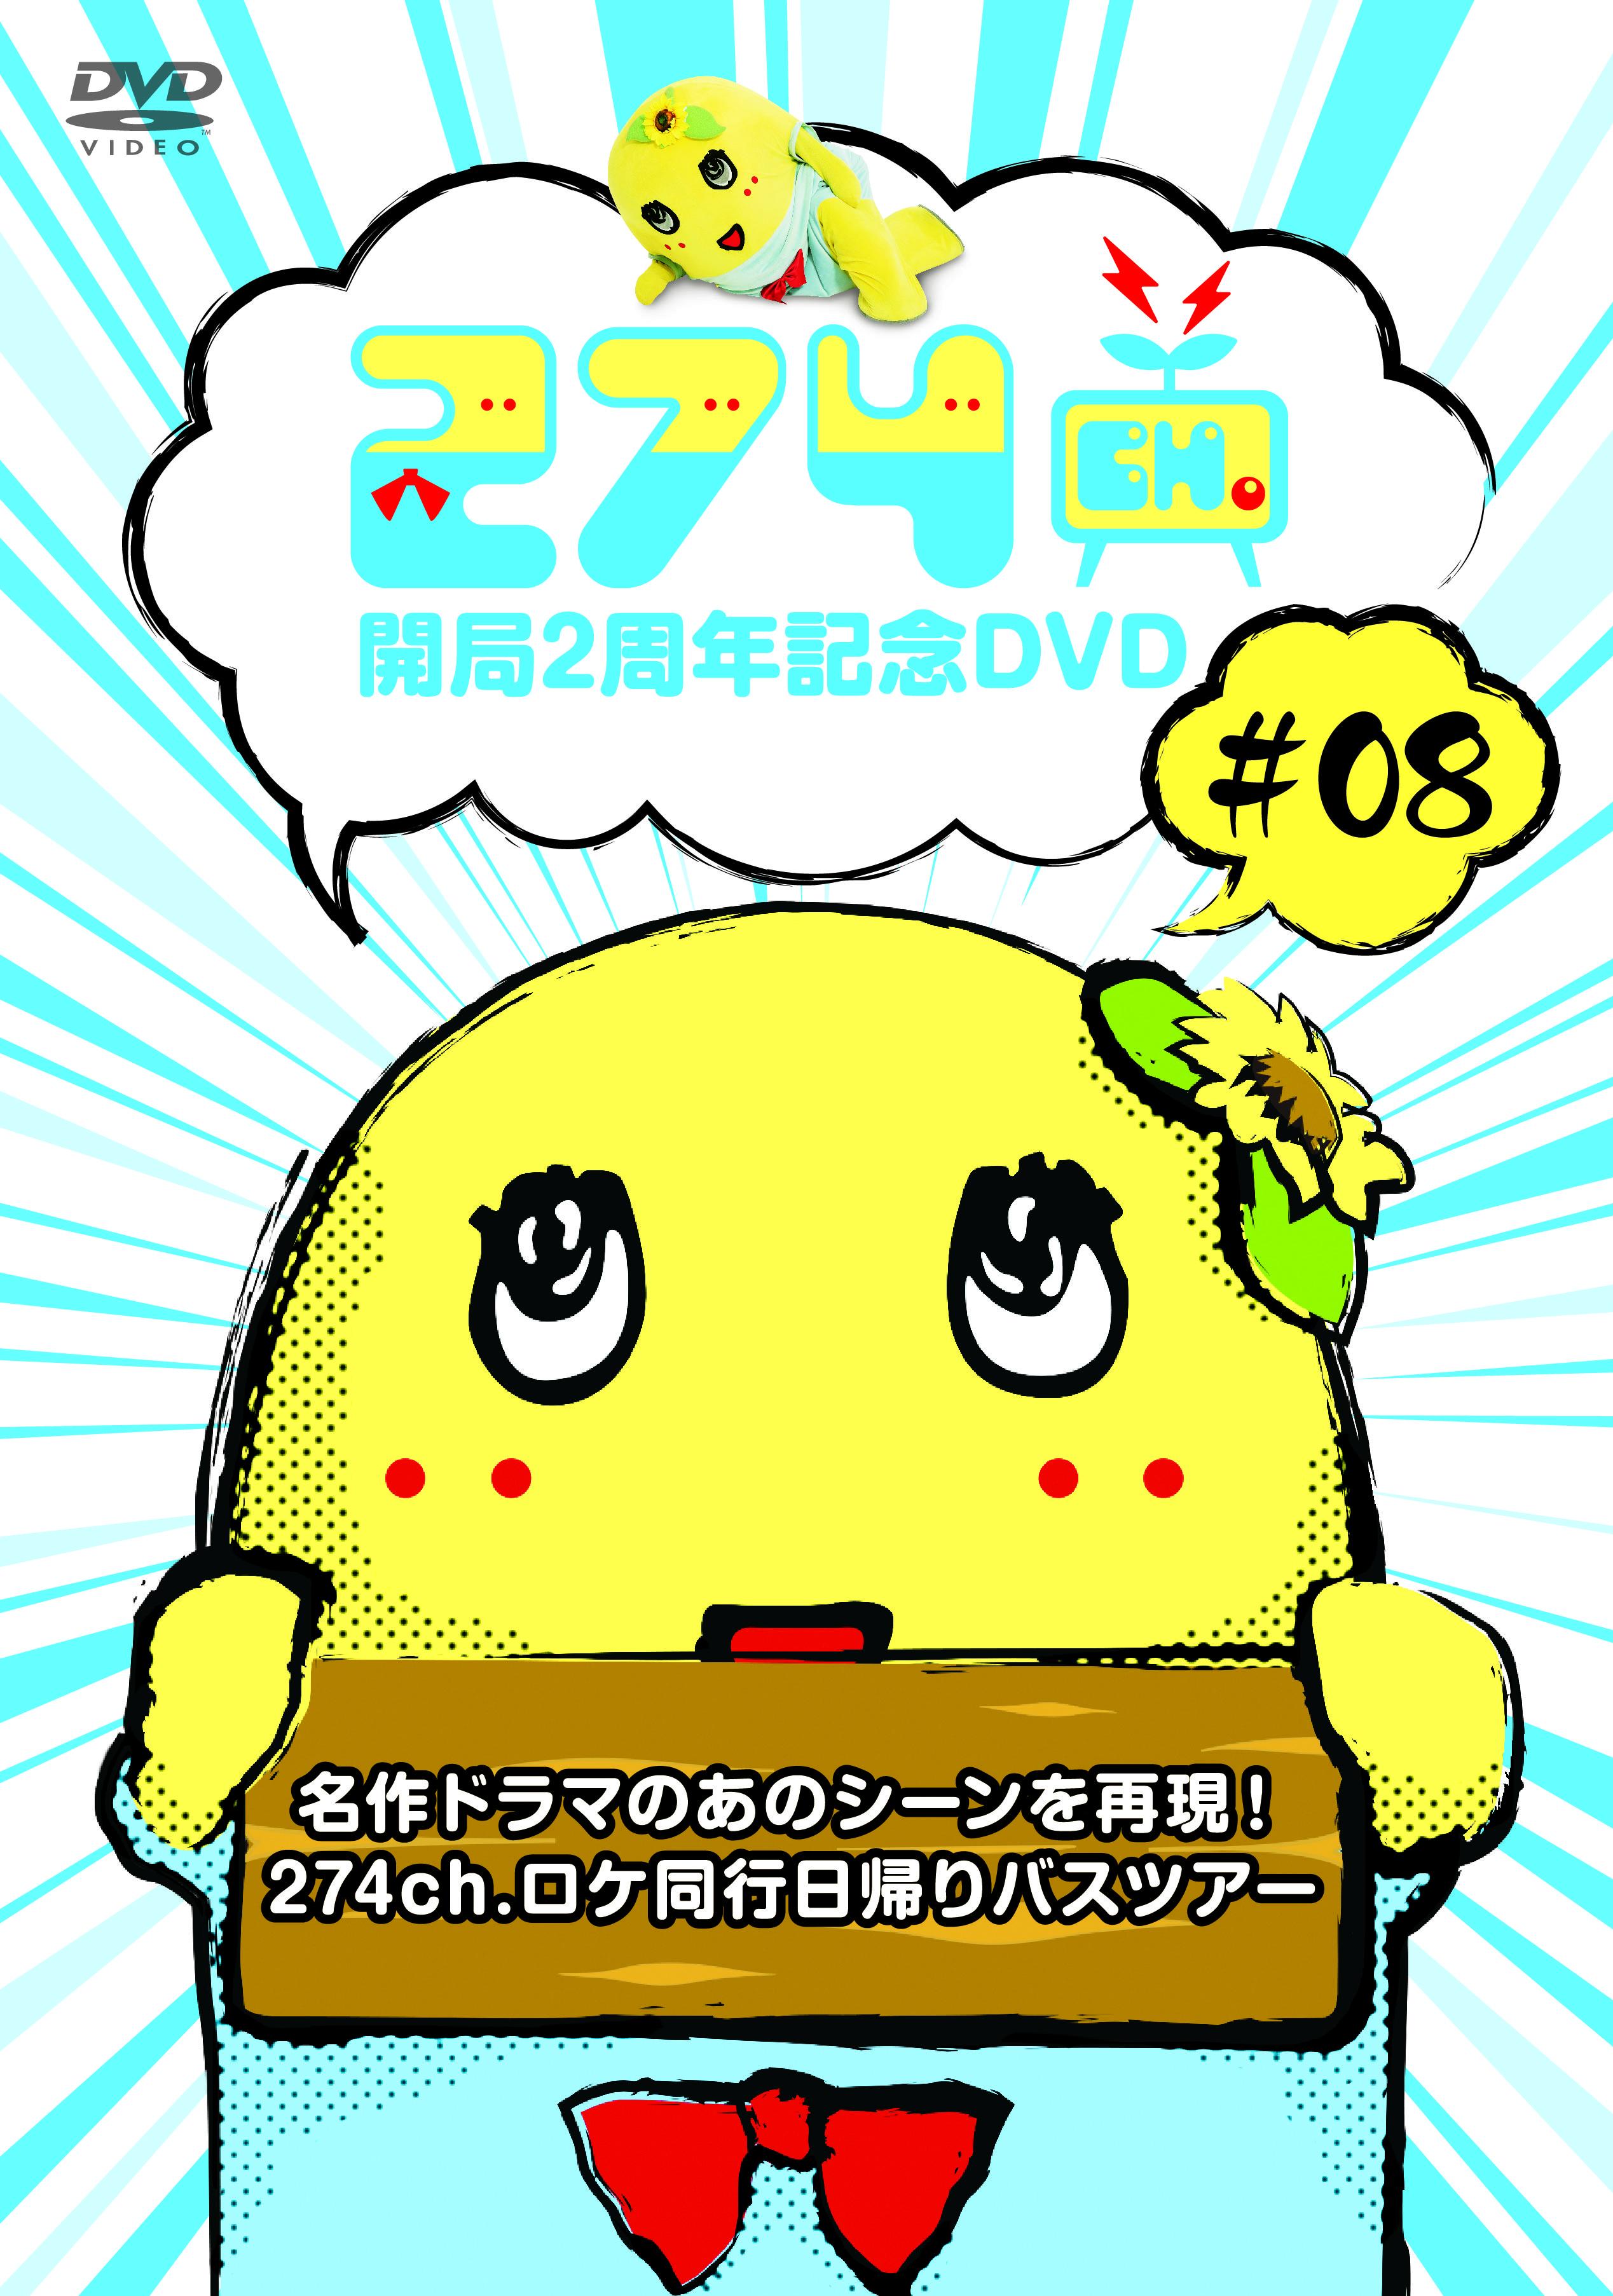 274ch. 開局2周年記念DVD#8「名作ドラマのあのシーンを再現!/274ch.ロケ同行日帰りバスツアー」